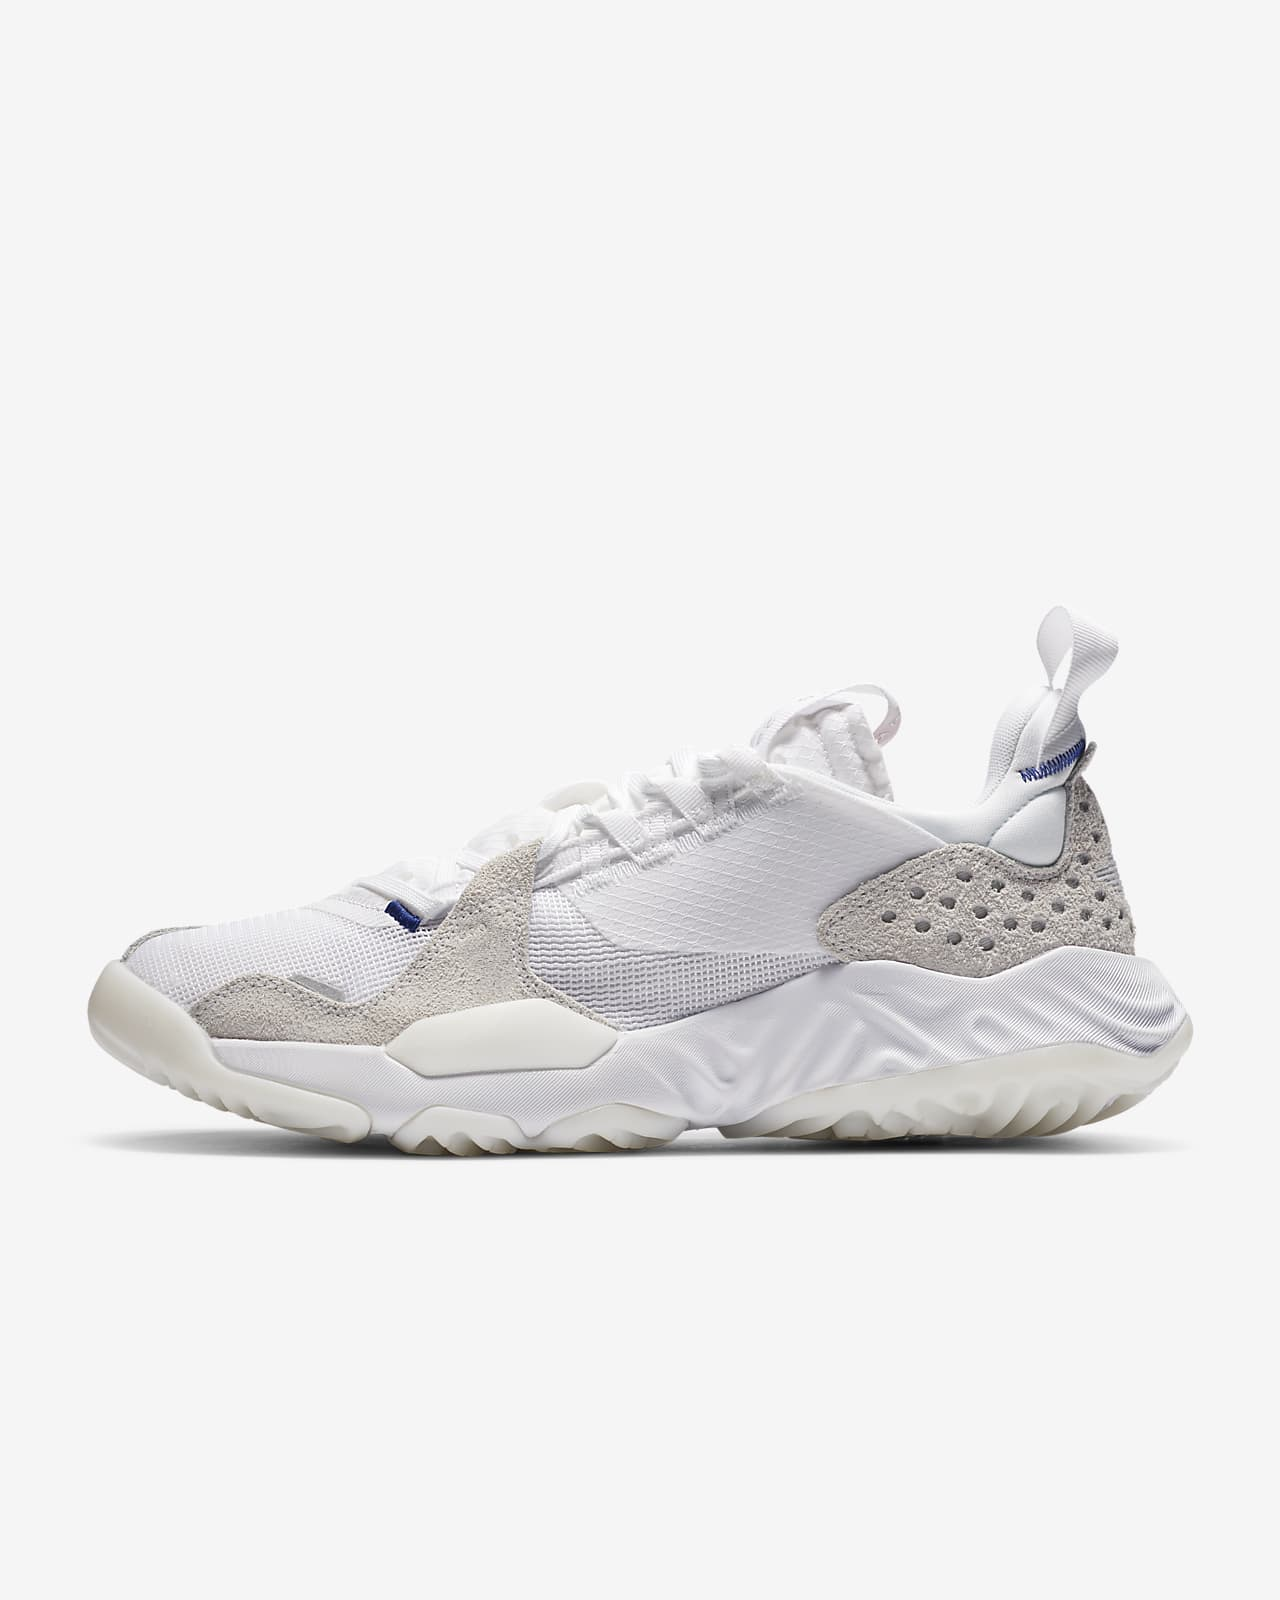 Jordan Delta Men's Shoe. Nike NZ